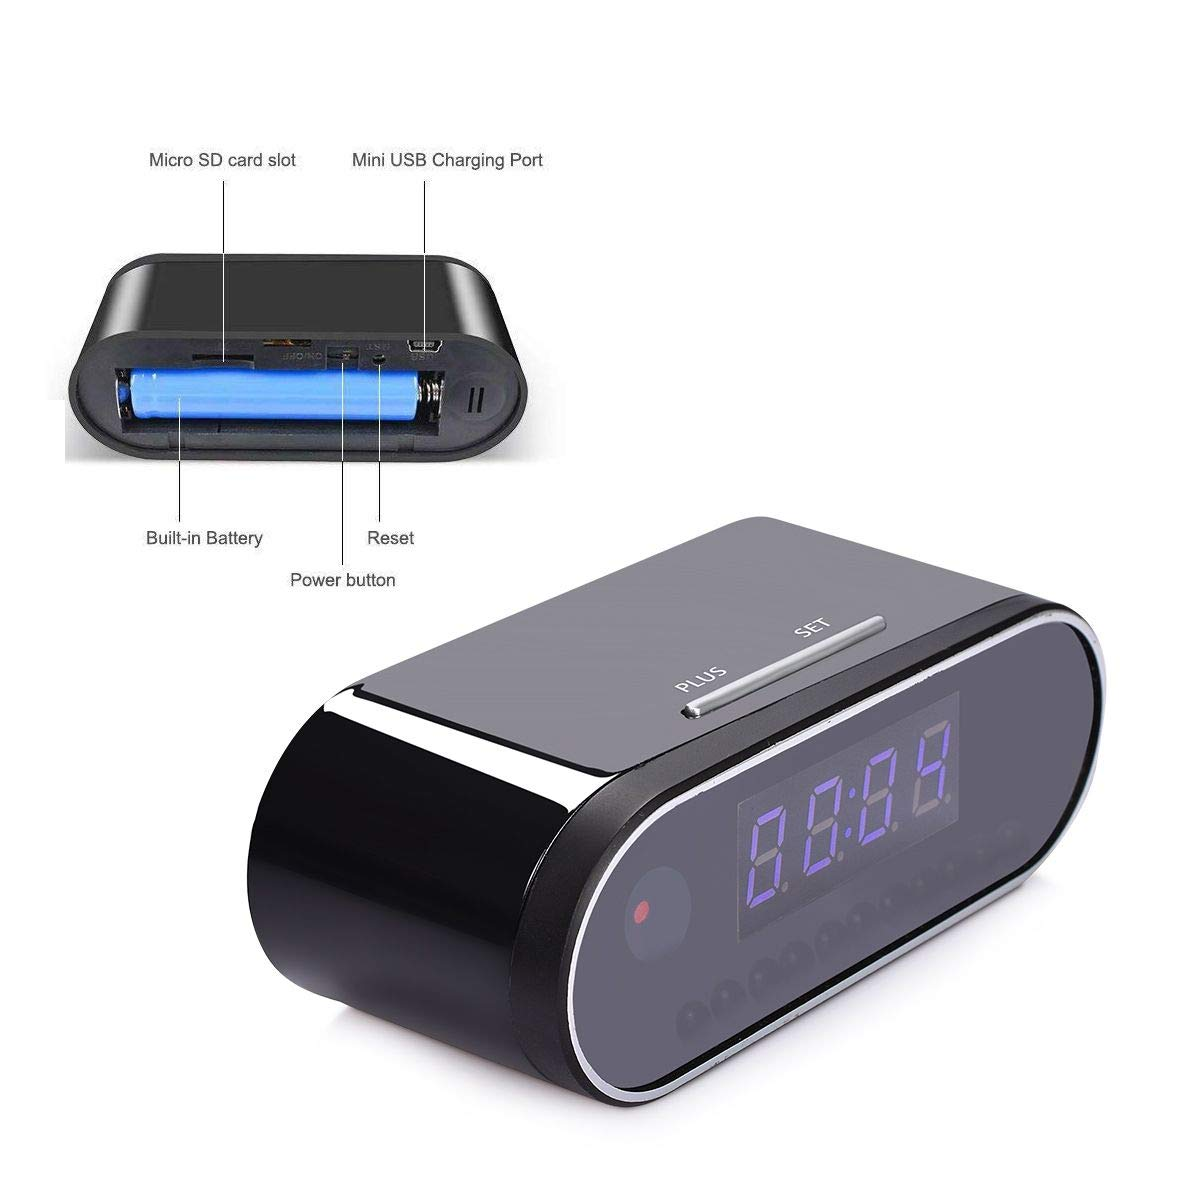 ABESTSUN WiFi Spy Camera Alarm Clock Hidden Nanny Cam,1080P Motion Detection Loop Recording Home Security Video Camera Cameratechspy zhishengcam clockcam